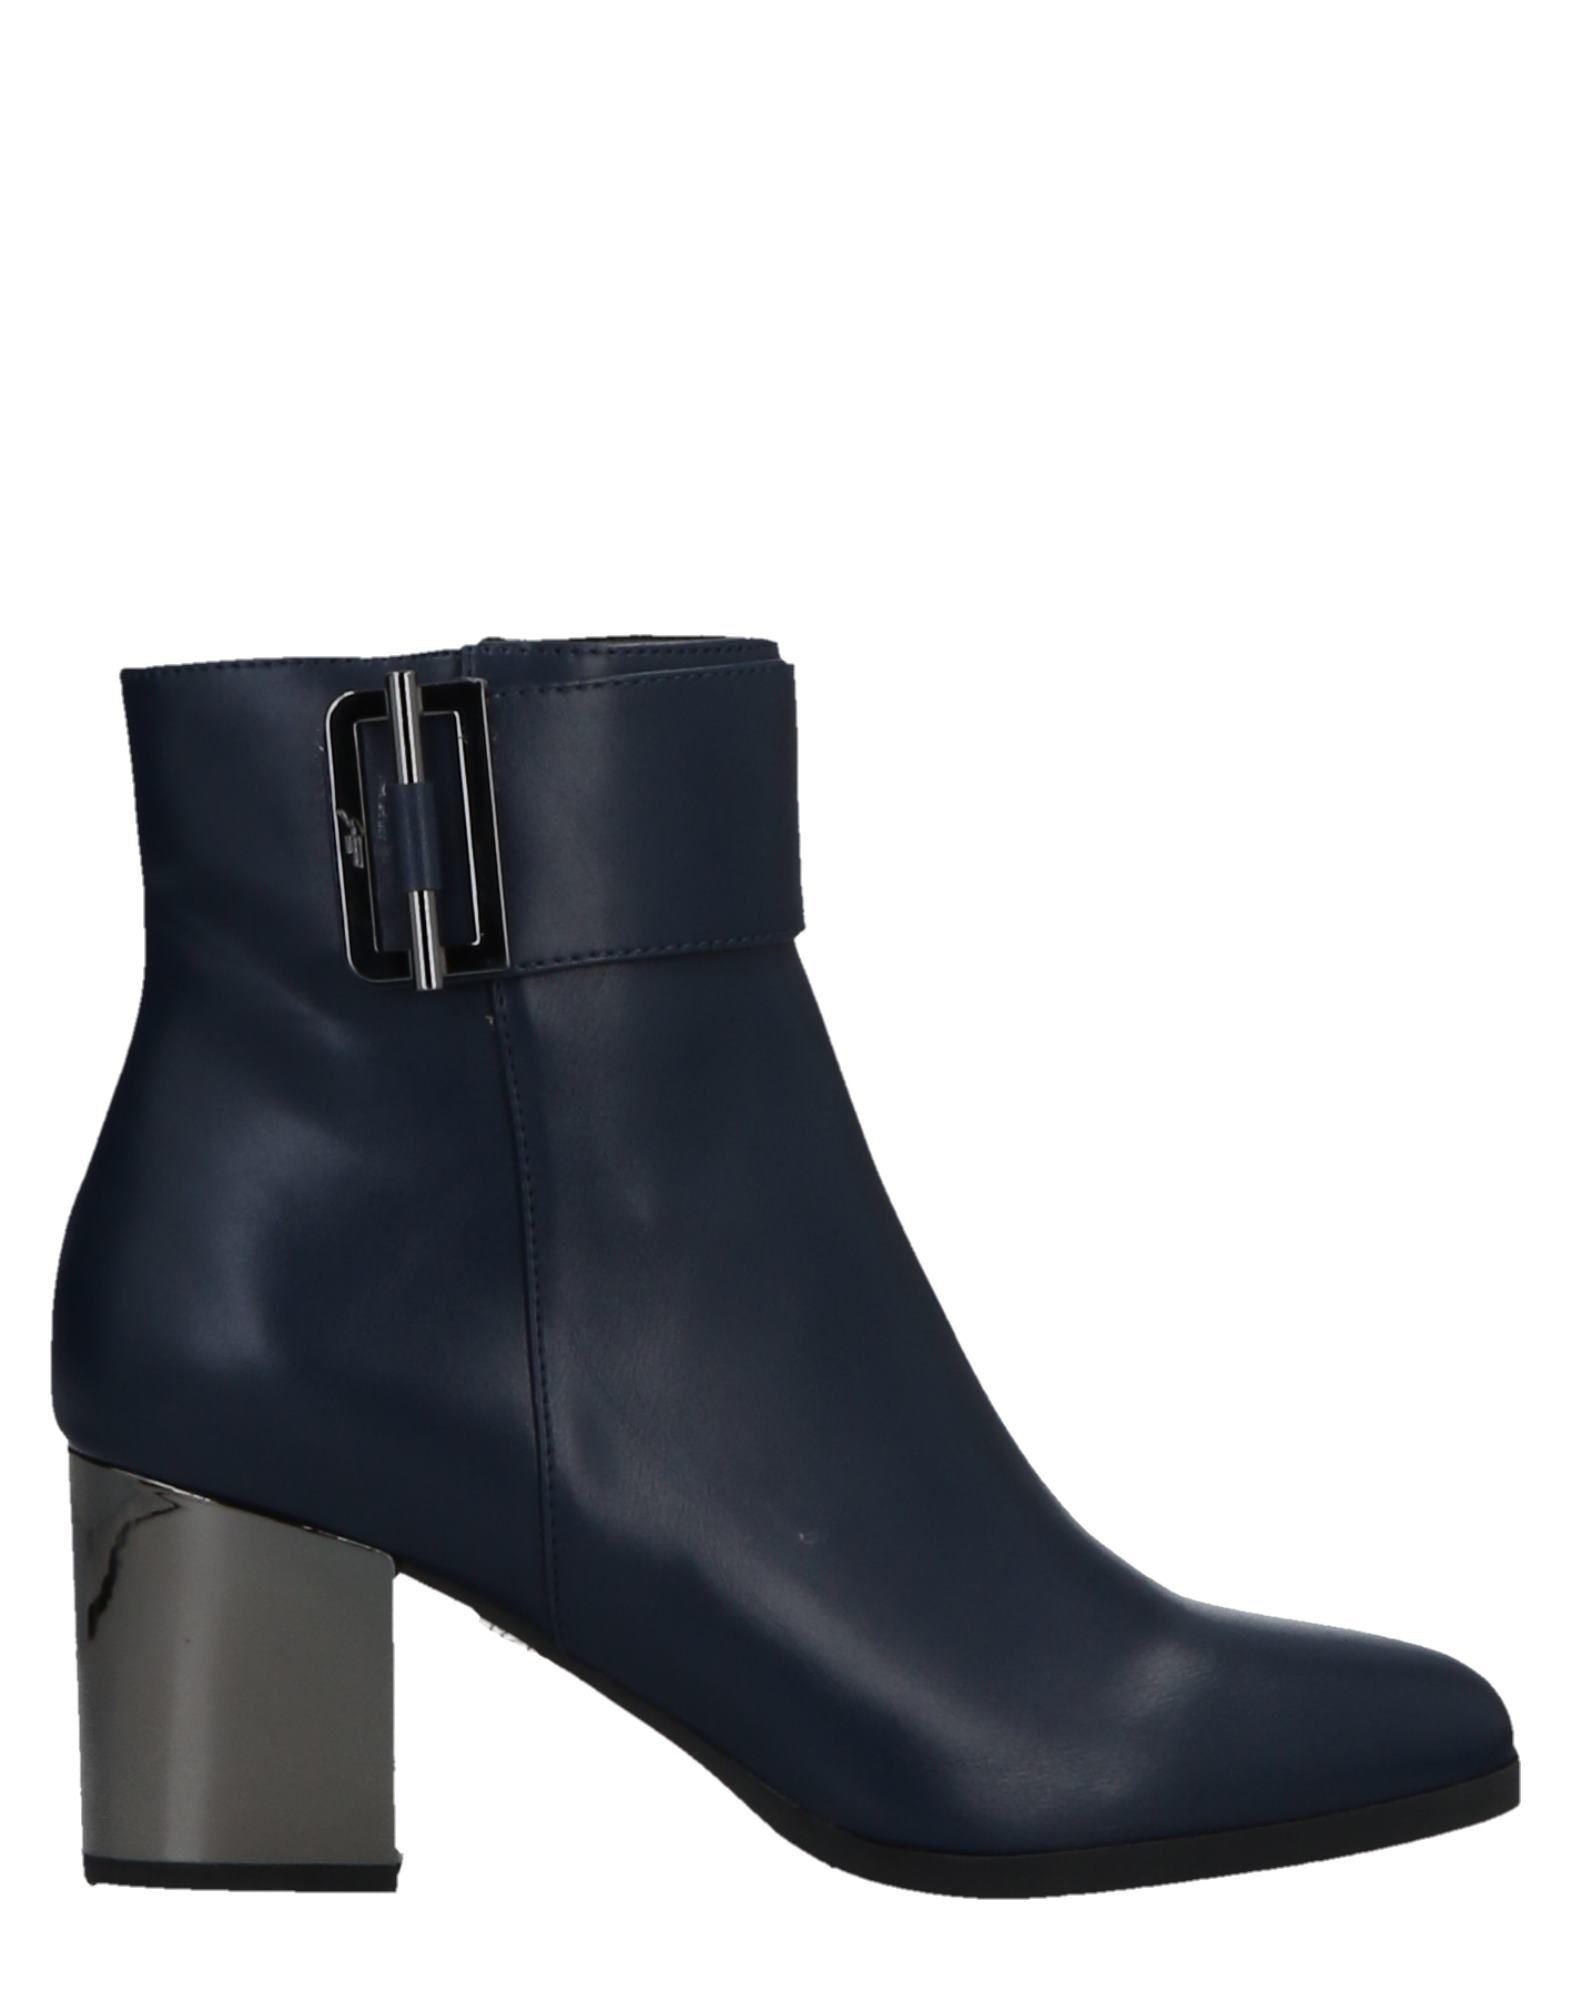 Gattinoni Stiefelette Damen  11517088LE Gute Qualität beliebte Schuhe